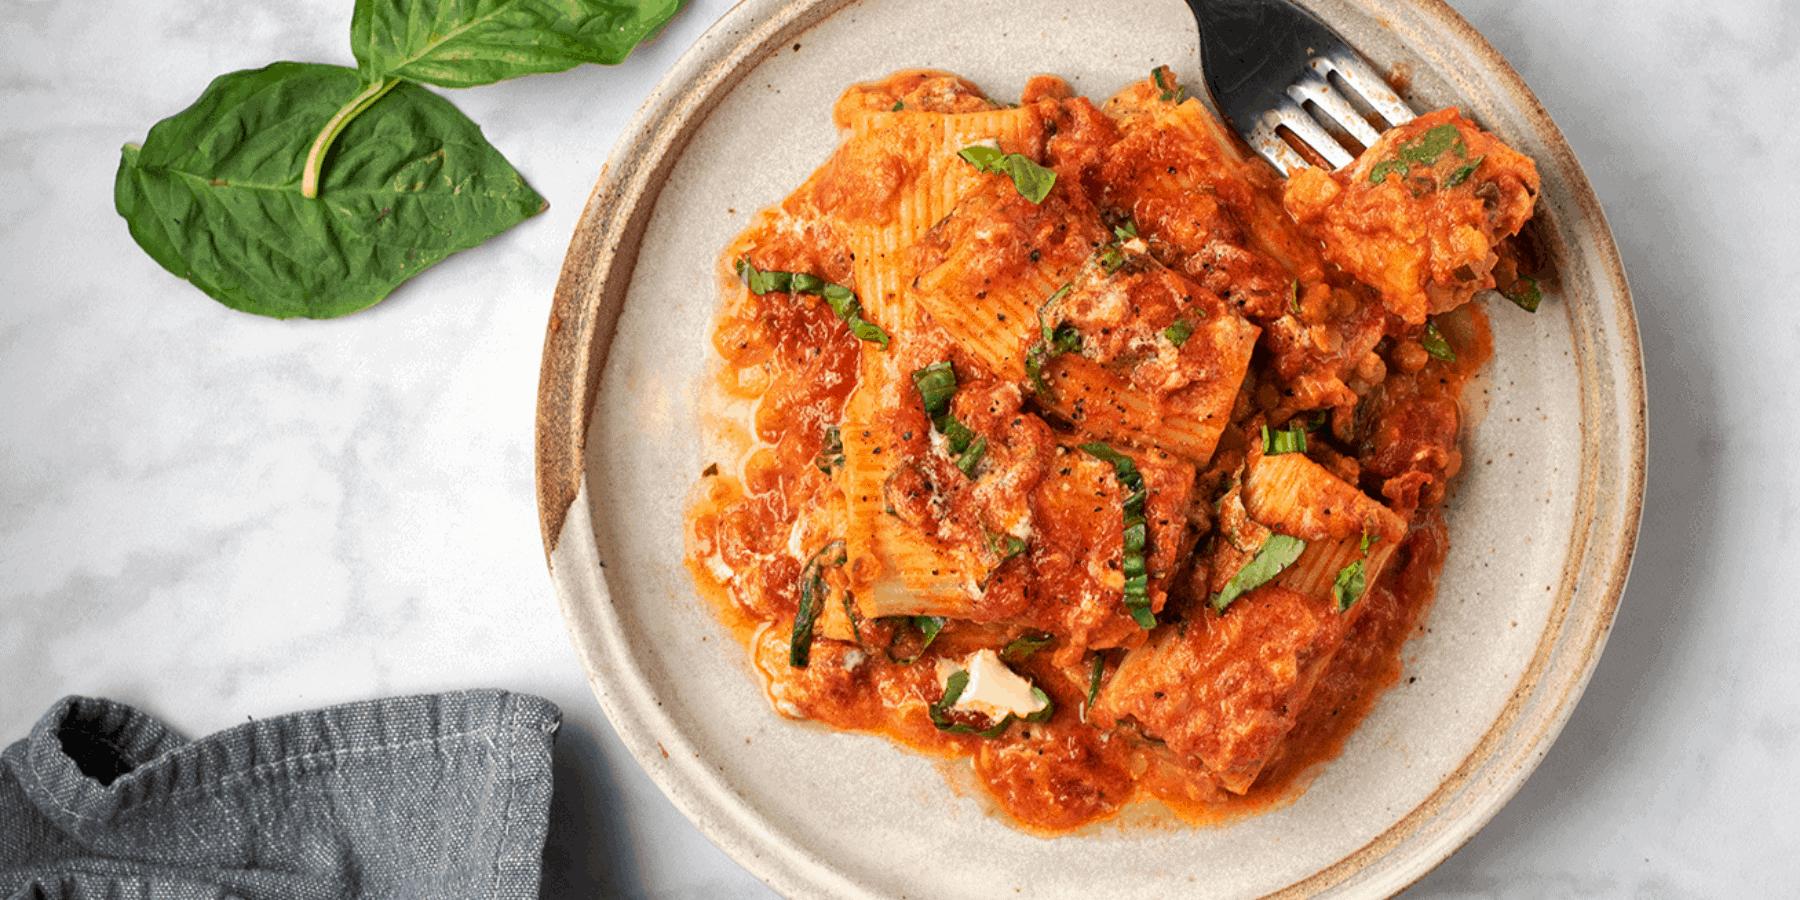 Vegan Baked Pasta Recipe